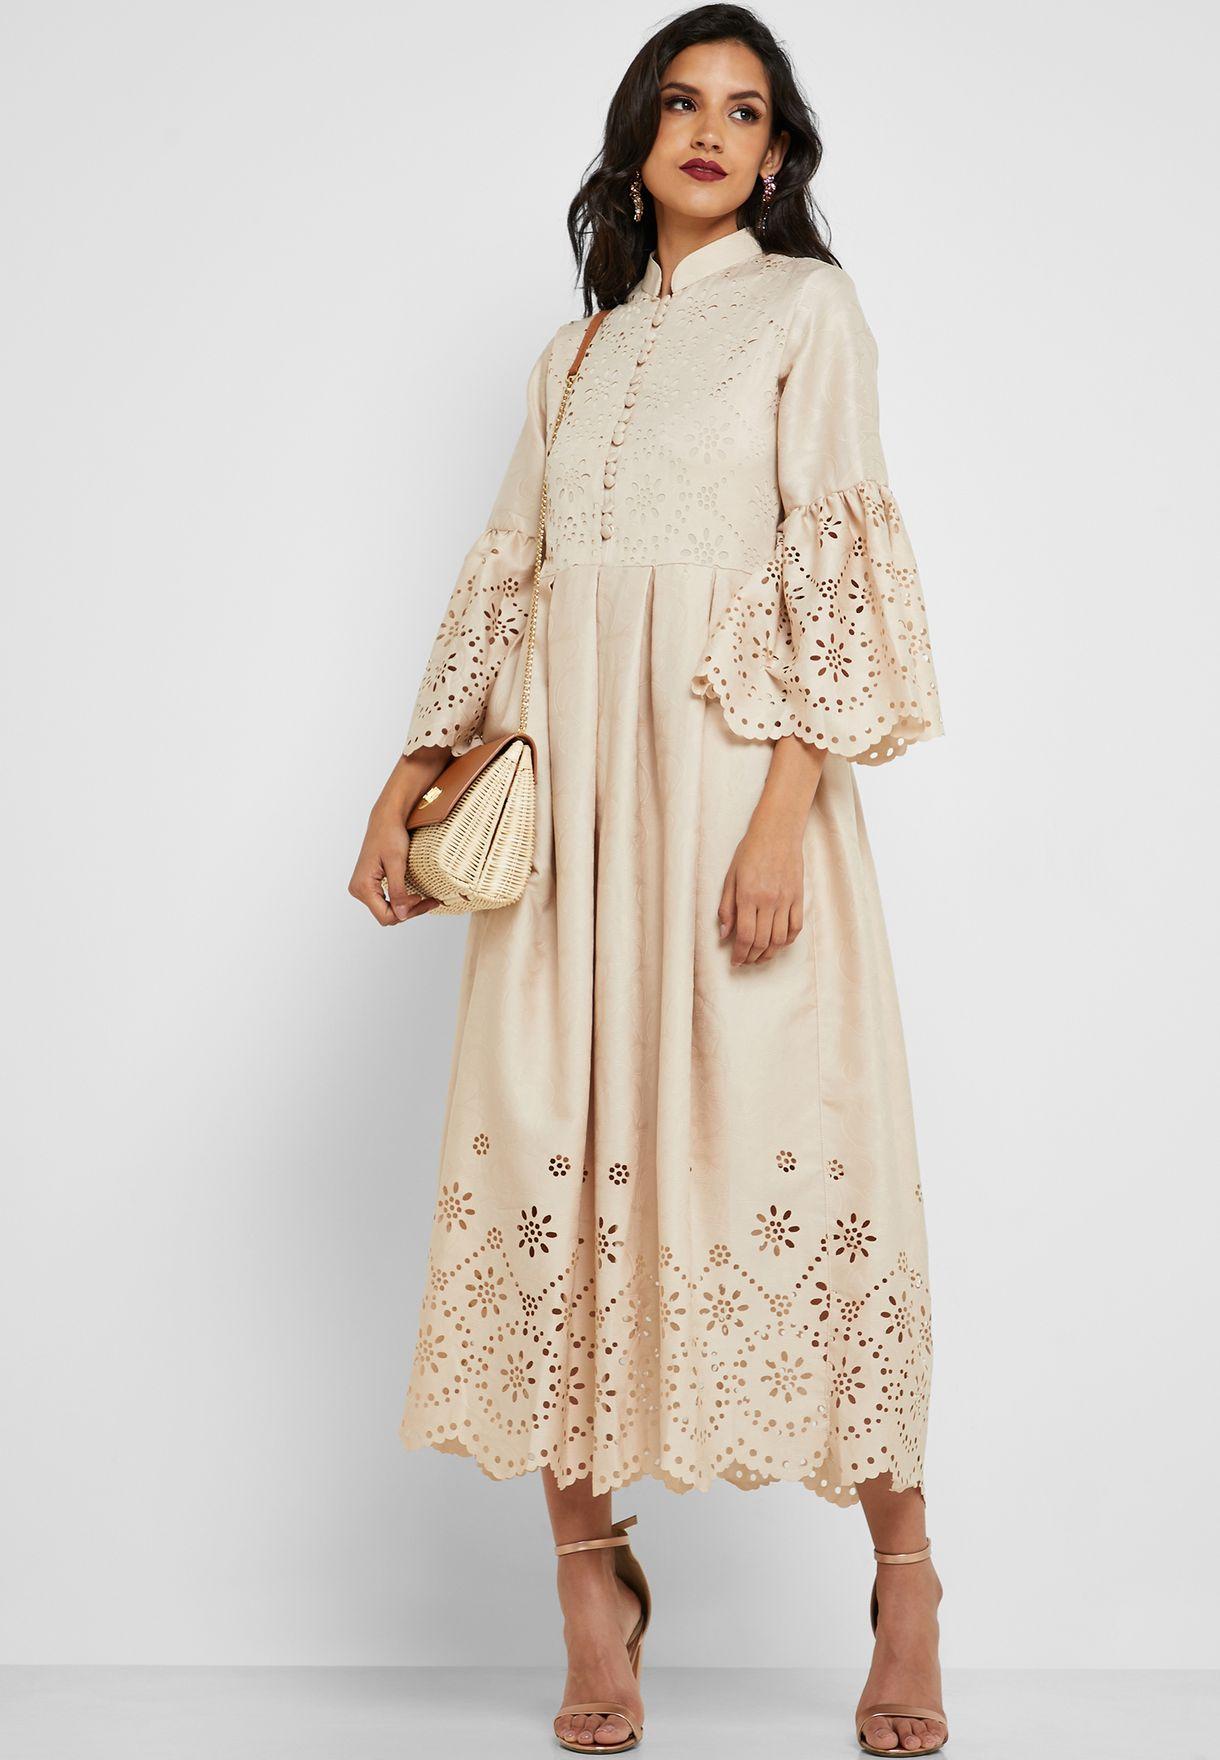 فستان مزين بفتحات ليزر